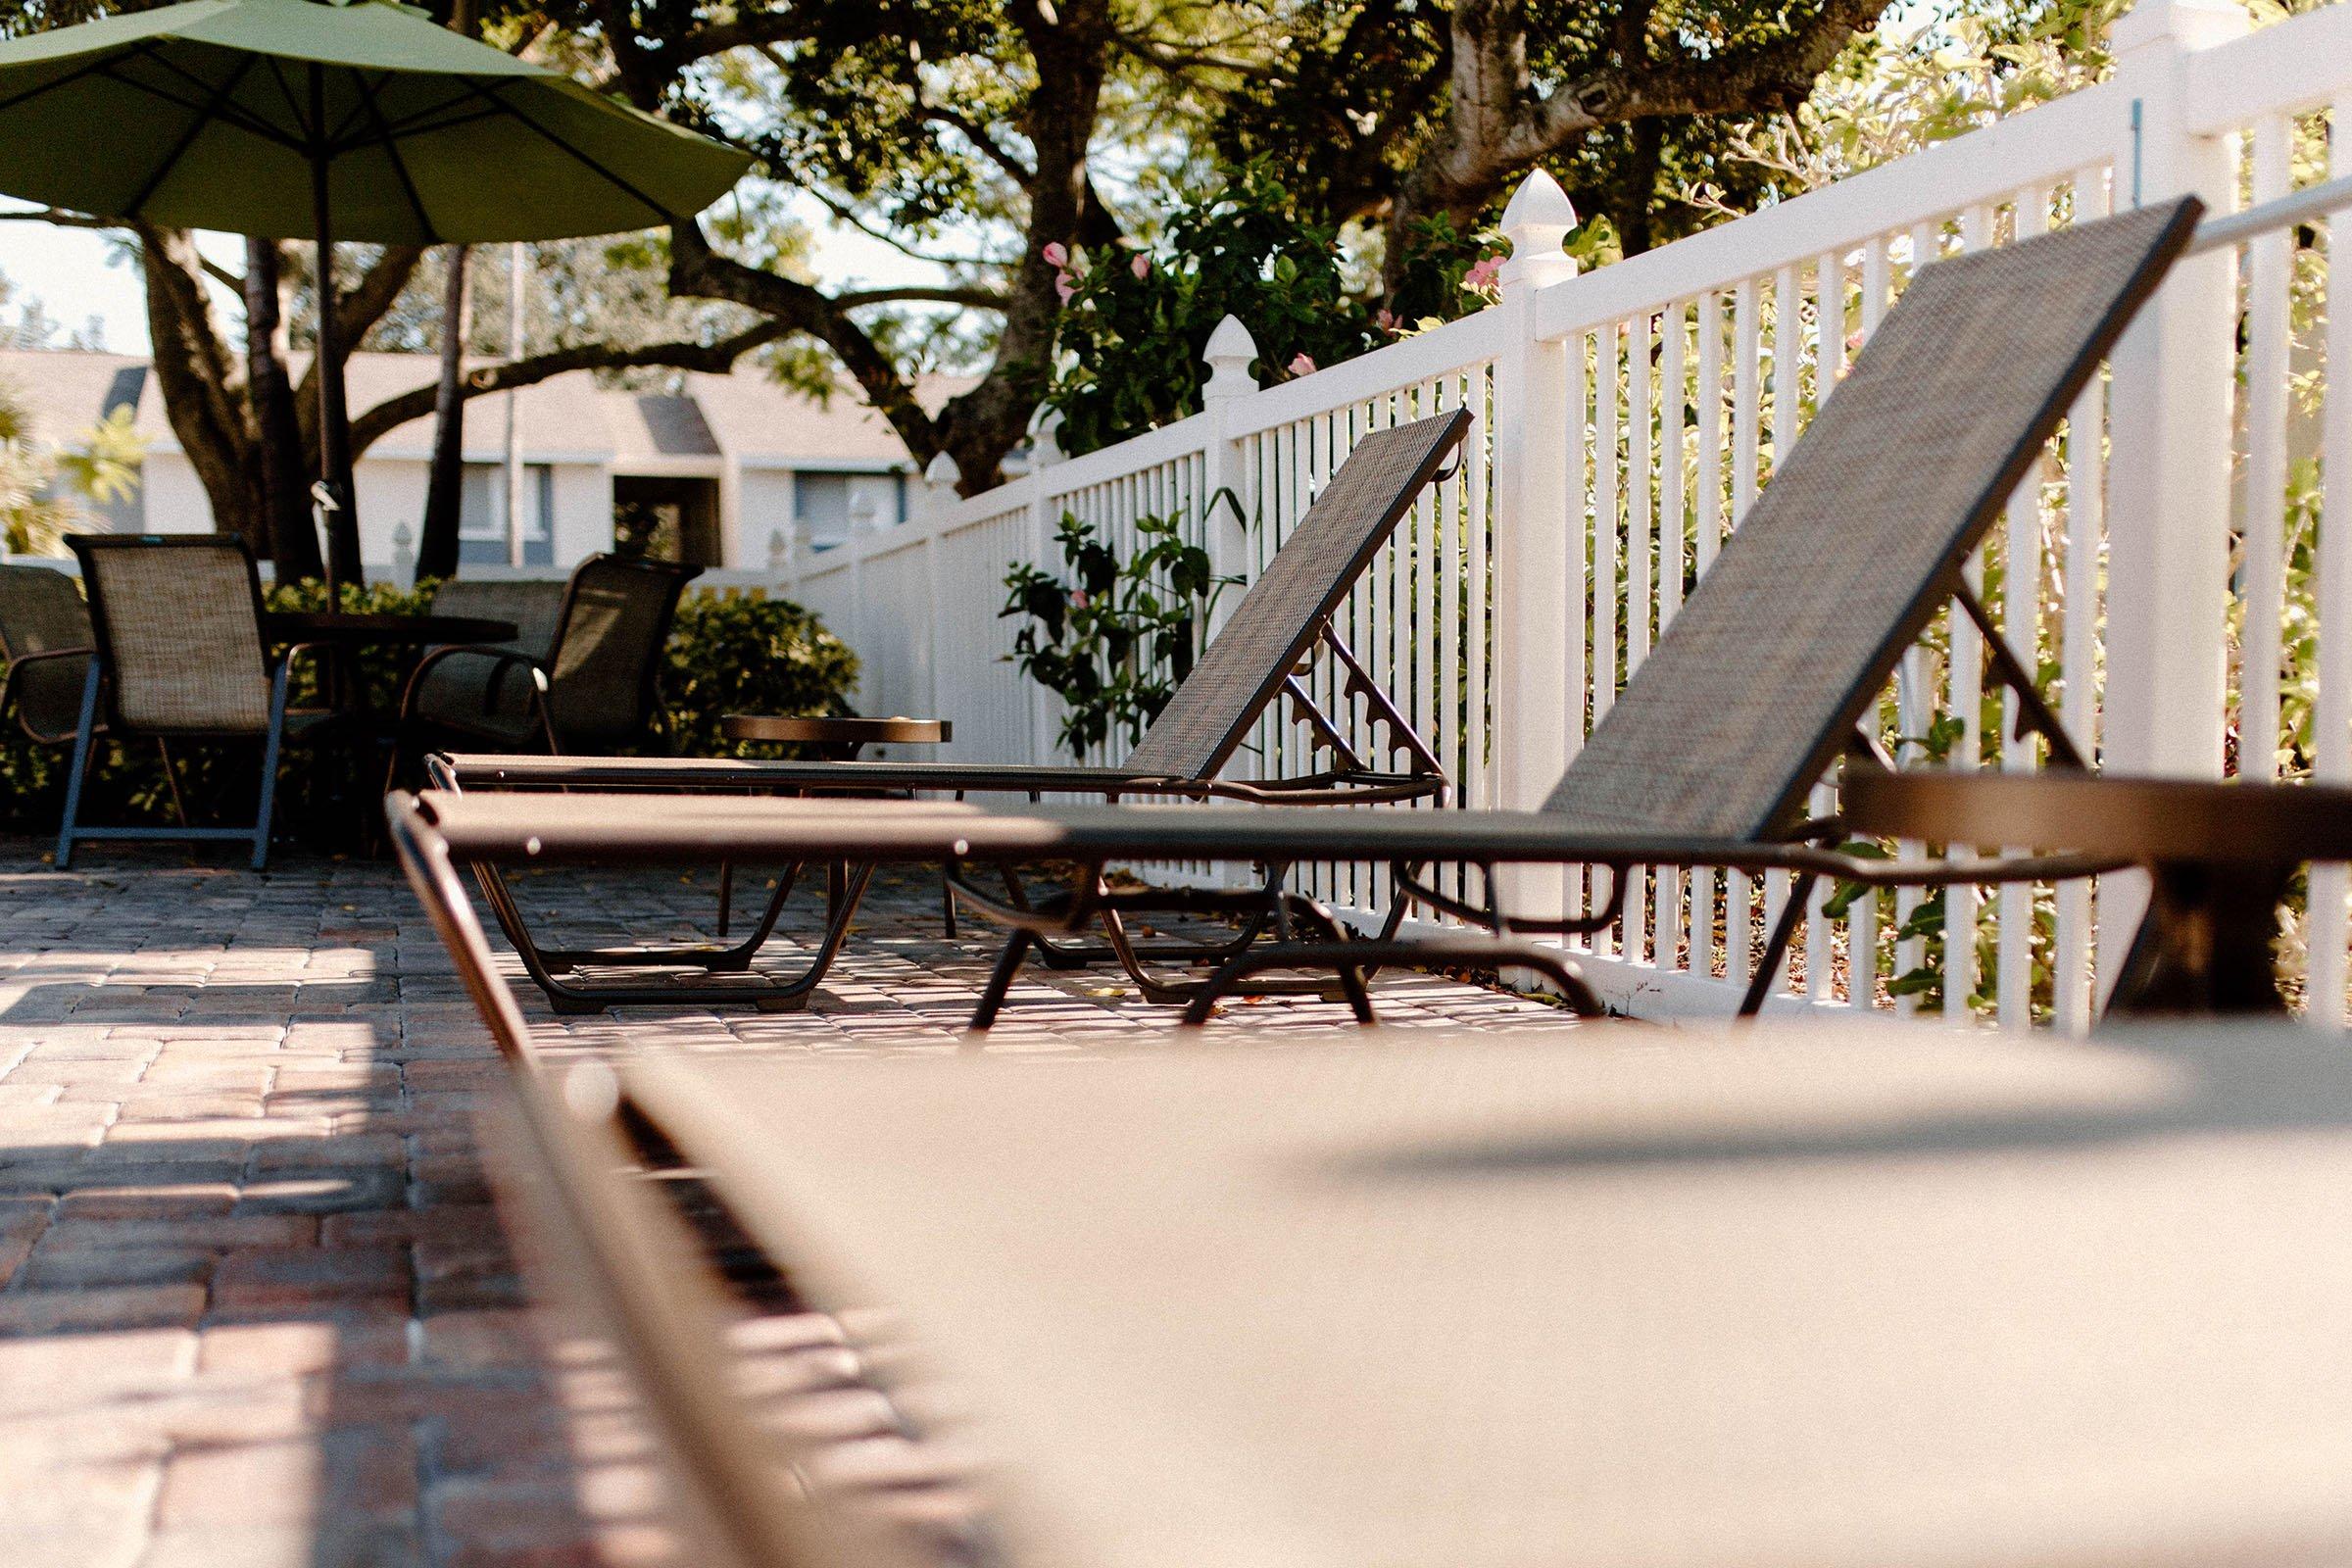 hotel outdoor furniture in South Carolina